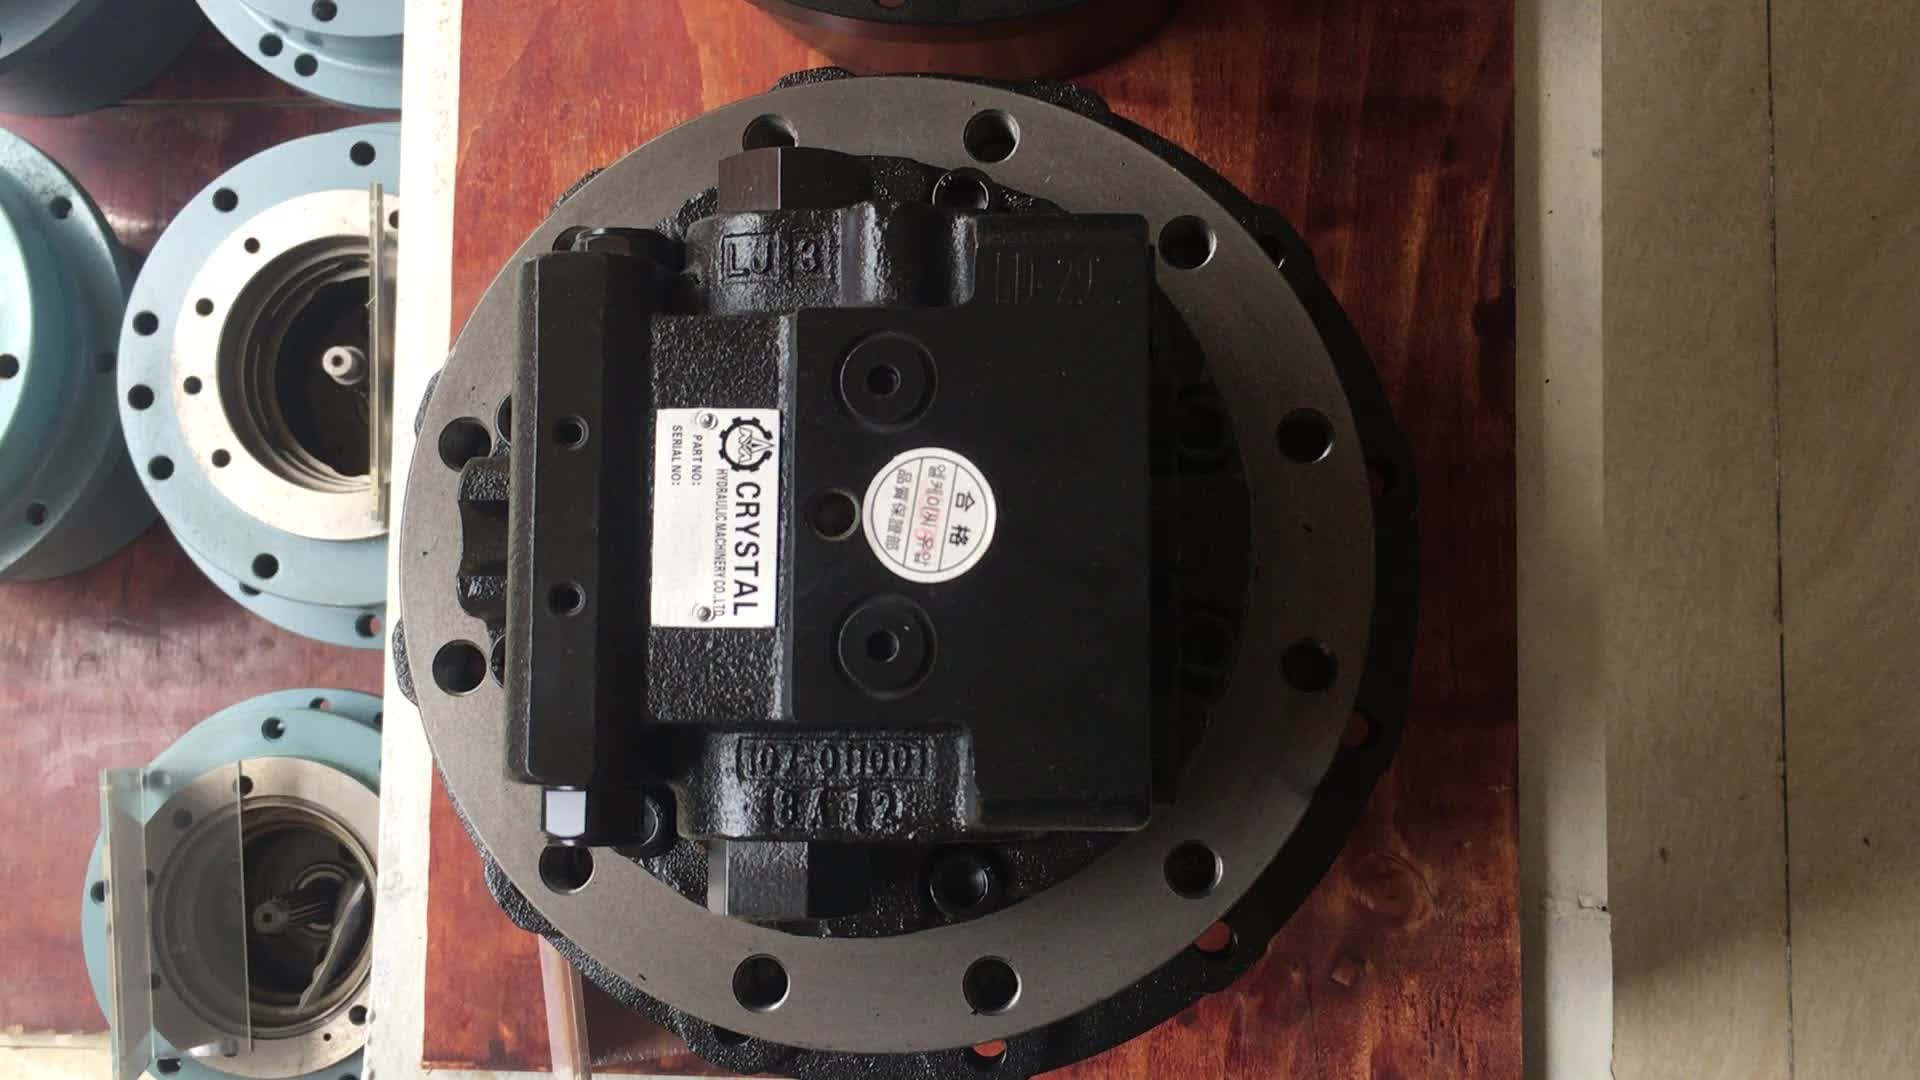 Excavator Travel Motor PC60-7 PC60-6 SK60-3 SK60-5 XG80 PC60-3 PC60-5 E70B SH60-1 SH60-2 GM09 Final Drive Assy